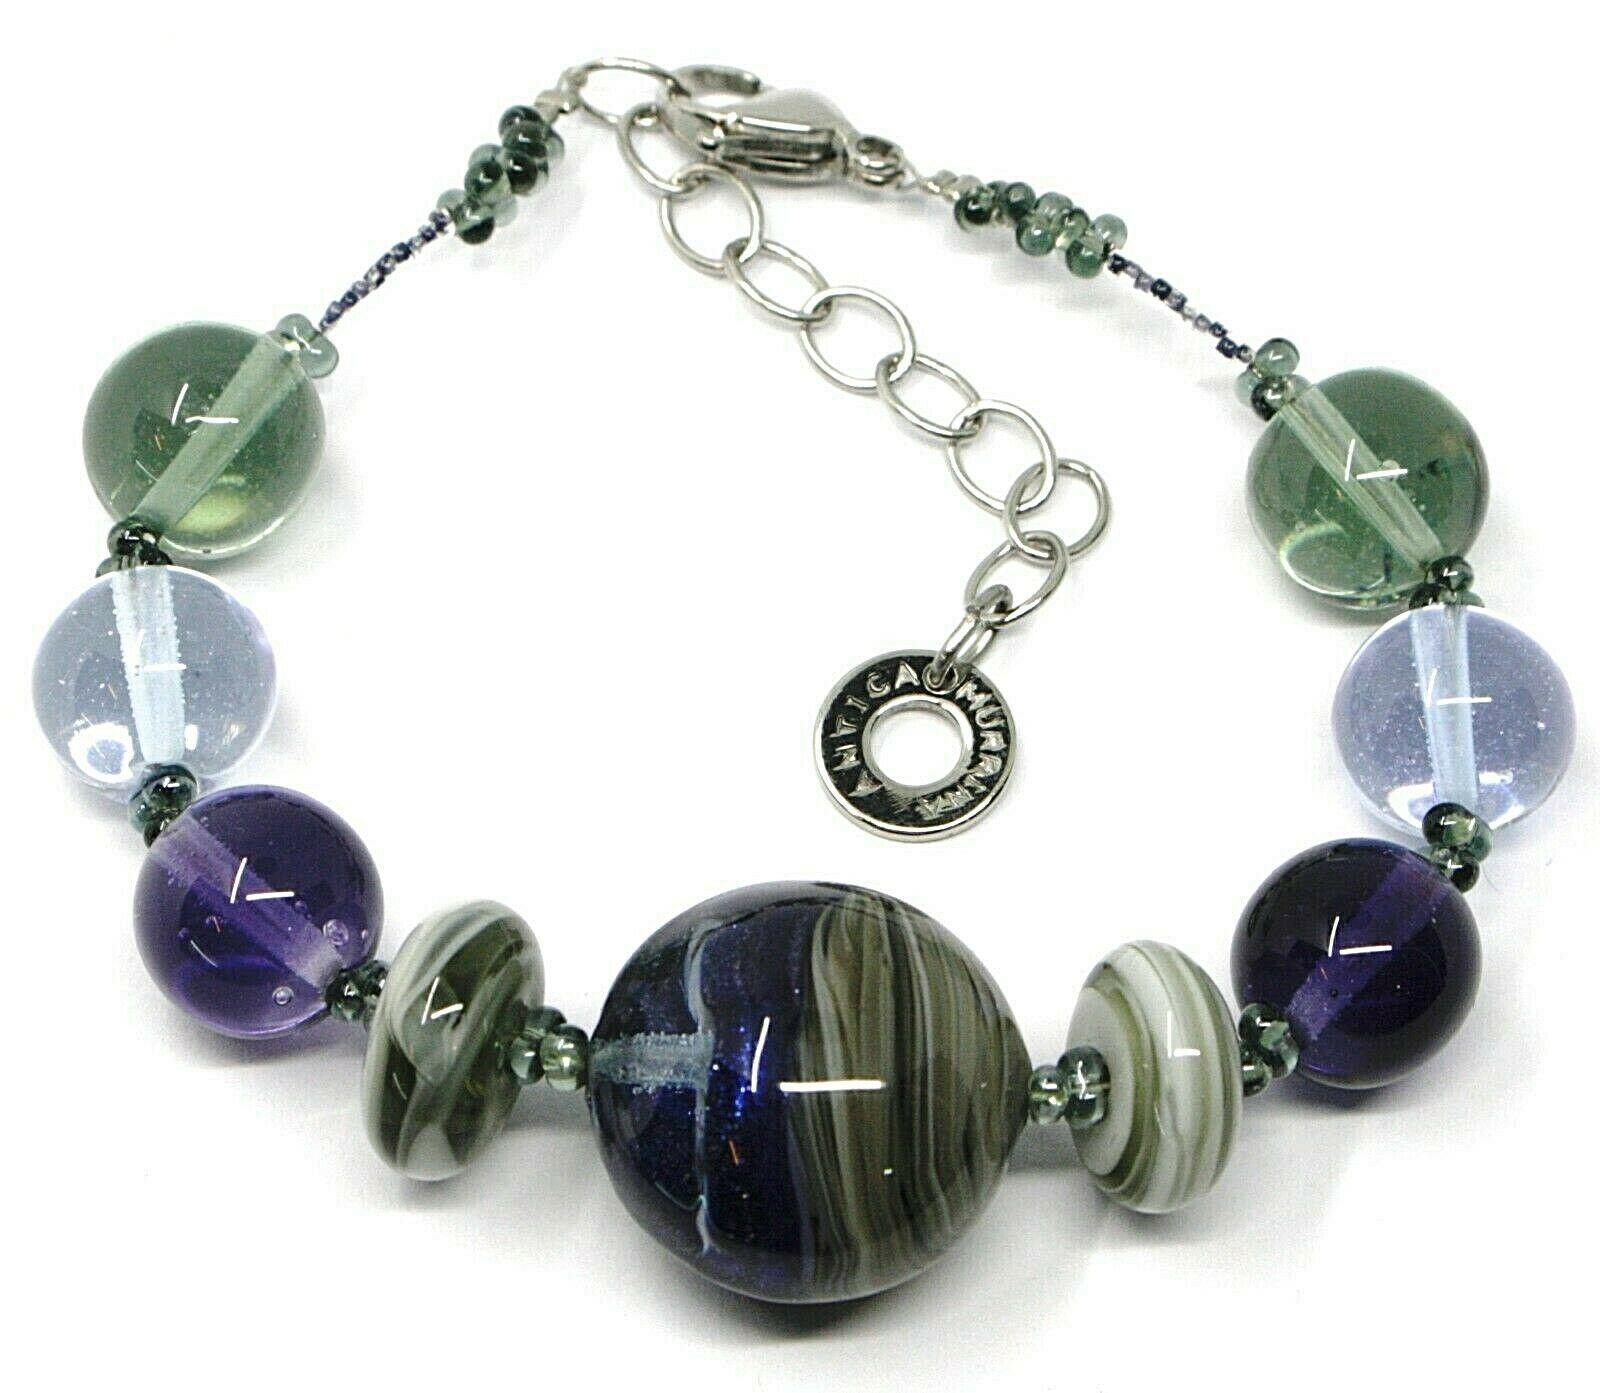 Bracelet Antica Murrina Venezia, BR578A27, Spheres Discs, Purple Green, Streaked